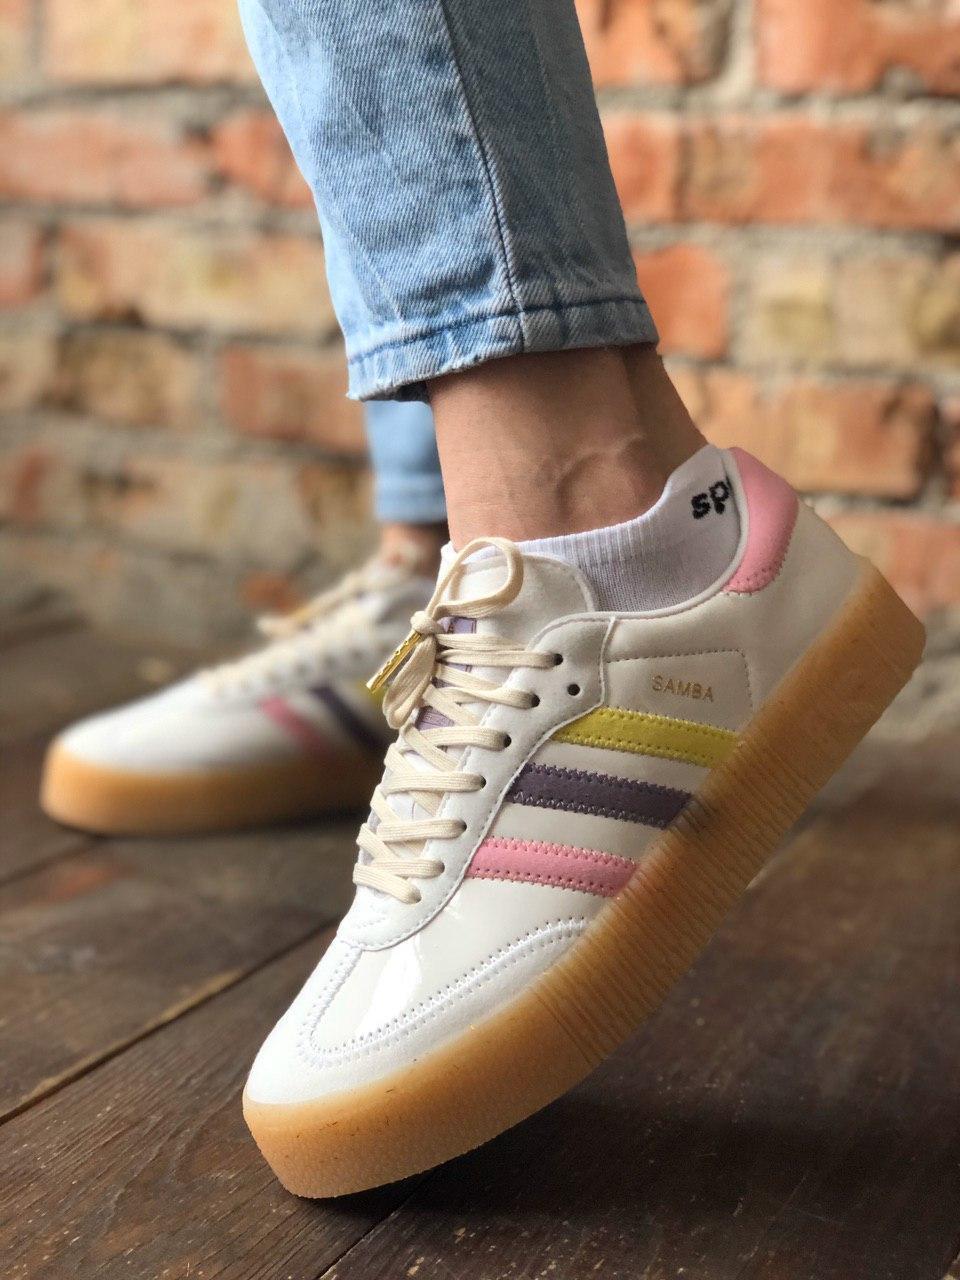 Женские кроссовки Adidas Samba white (Адидас Самба)